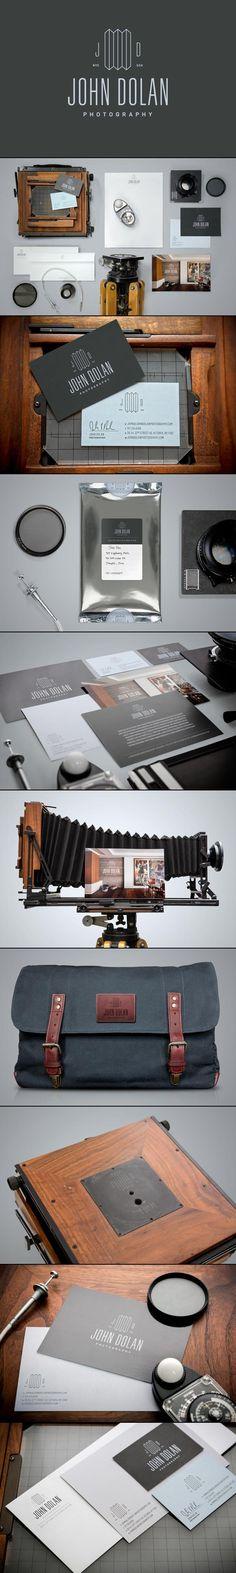 John Dolan Photography   #stationary #corporate #design #corporatedesign #identity #branding #marketing < repinned by www.BlickeDeeler.de